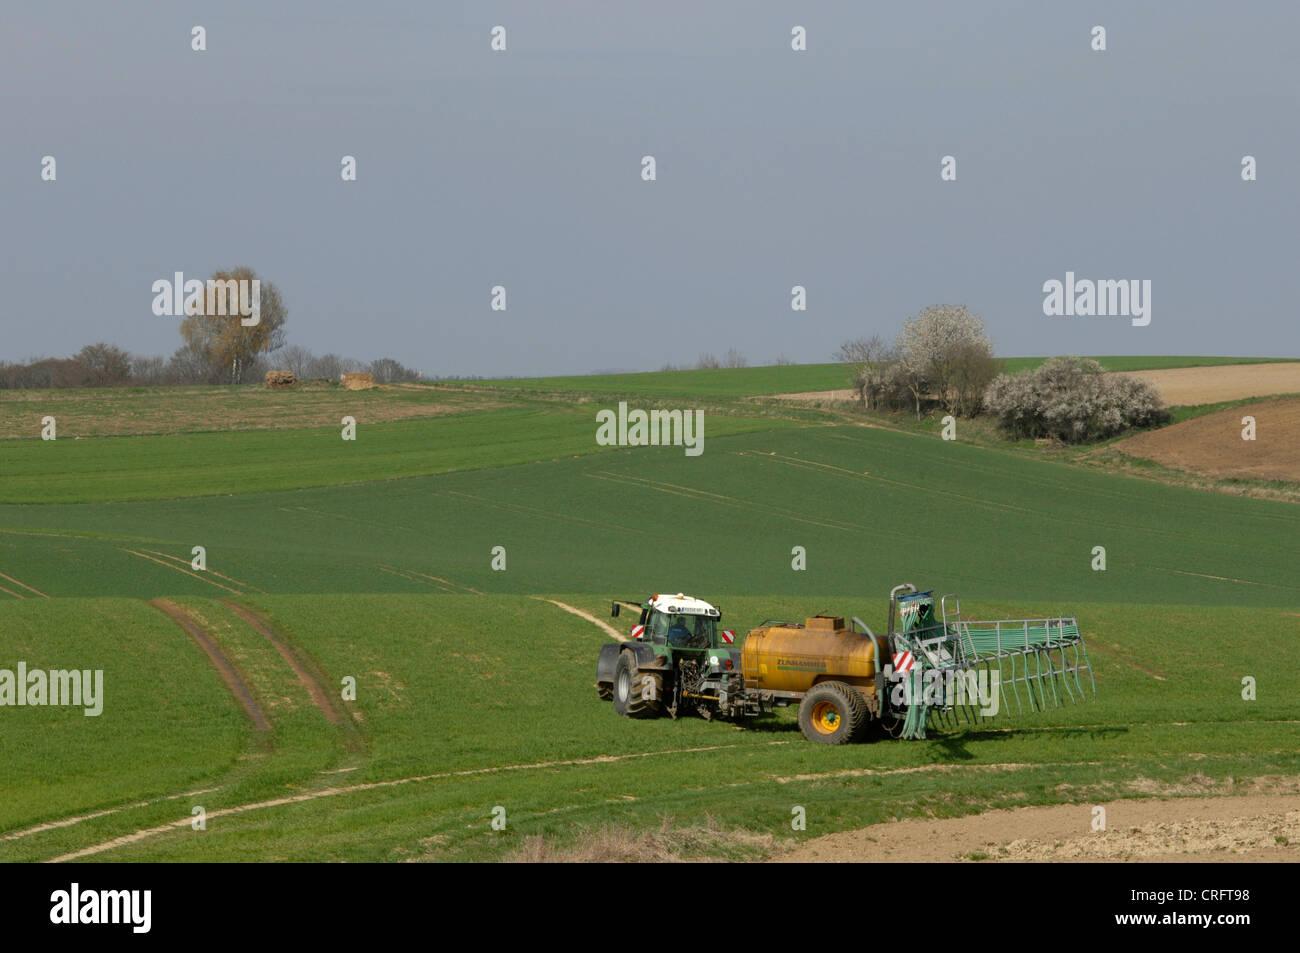 disposal of liquid manure, Germany Stock Photo